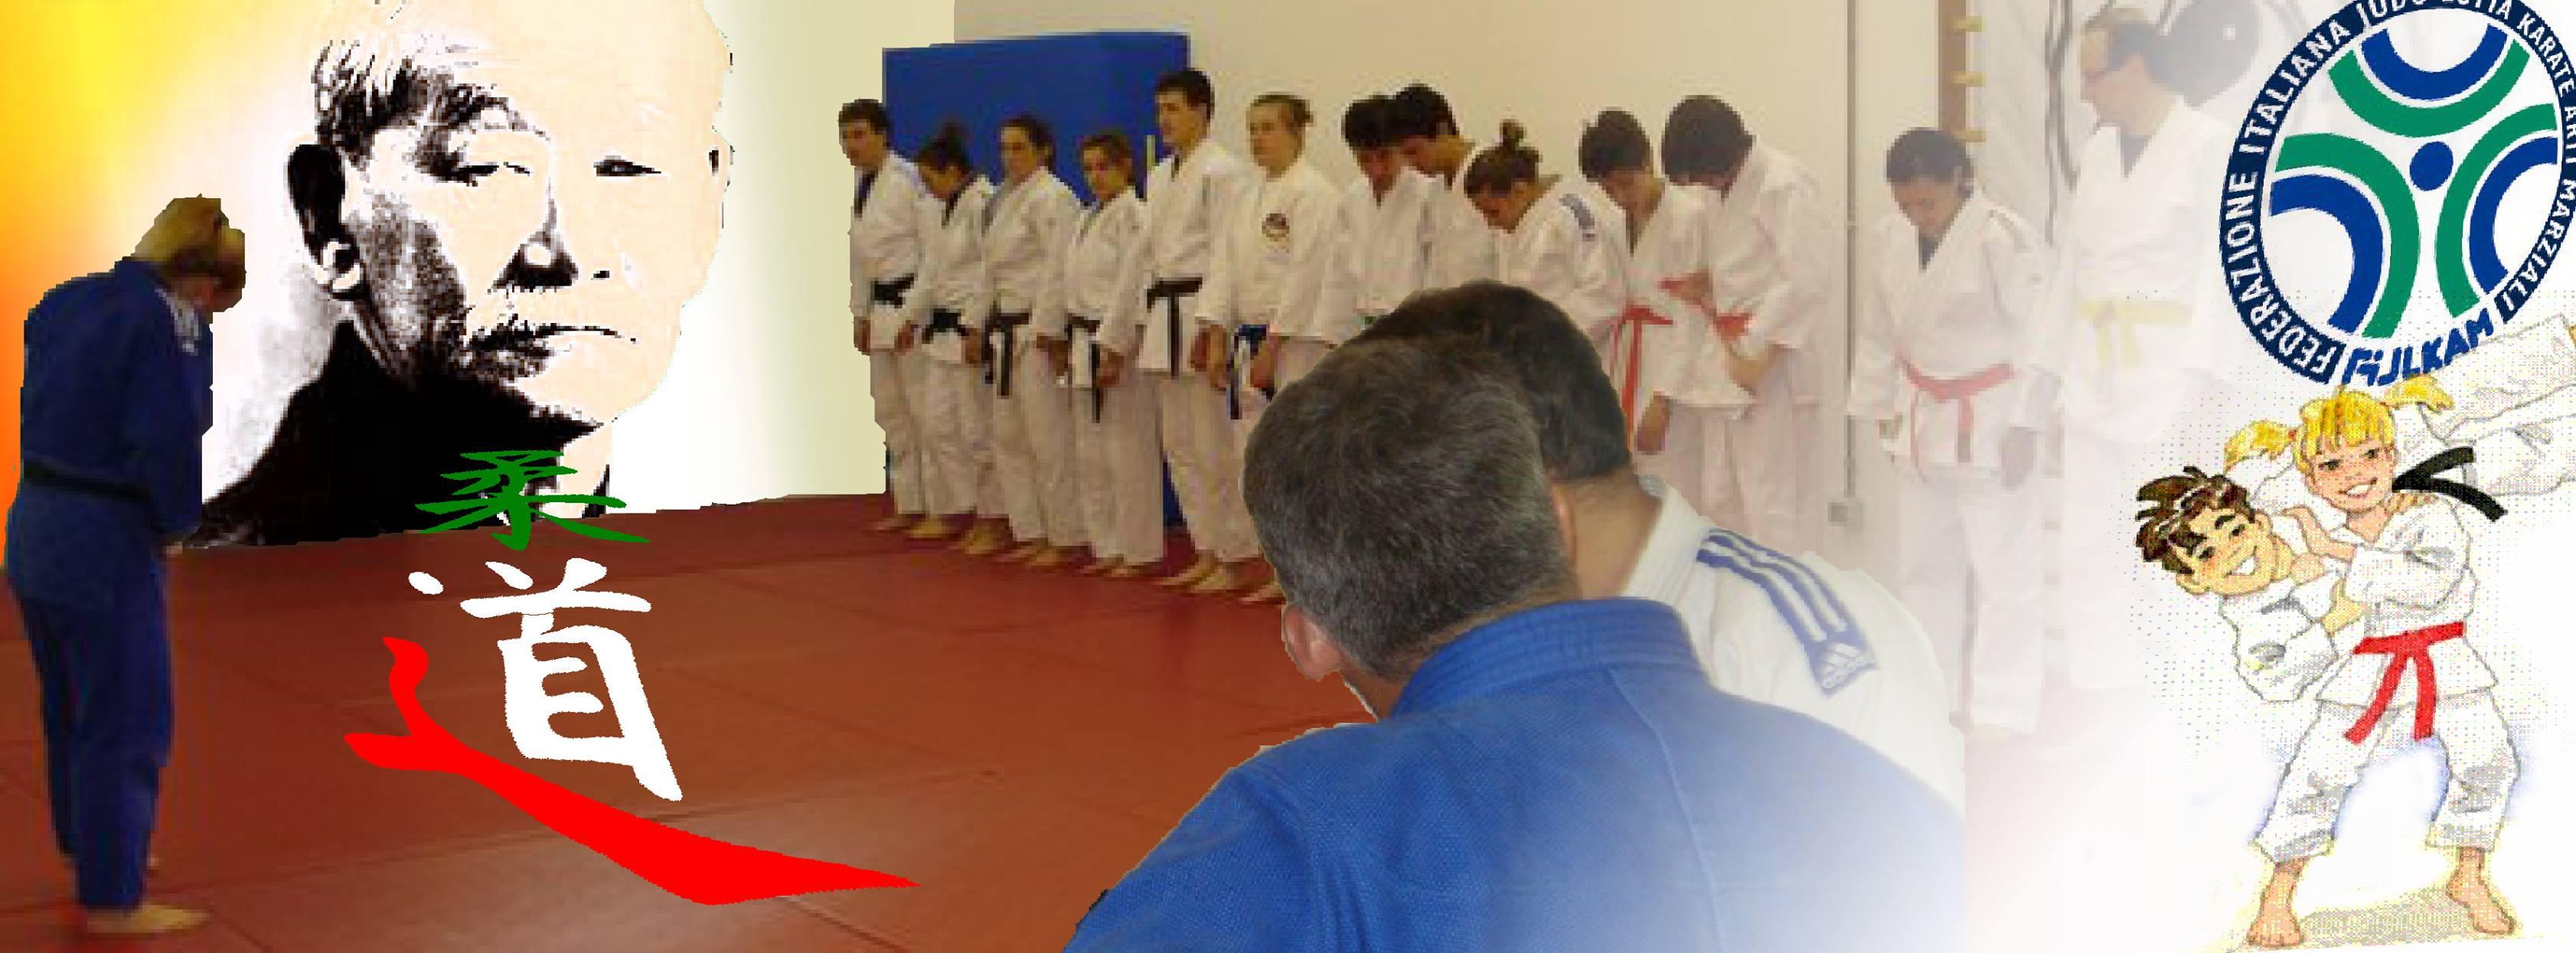 Weekly Jumi sessions at Judo San club in Trento